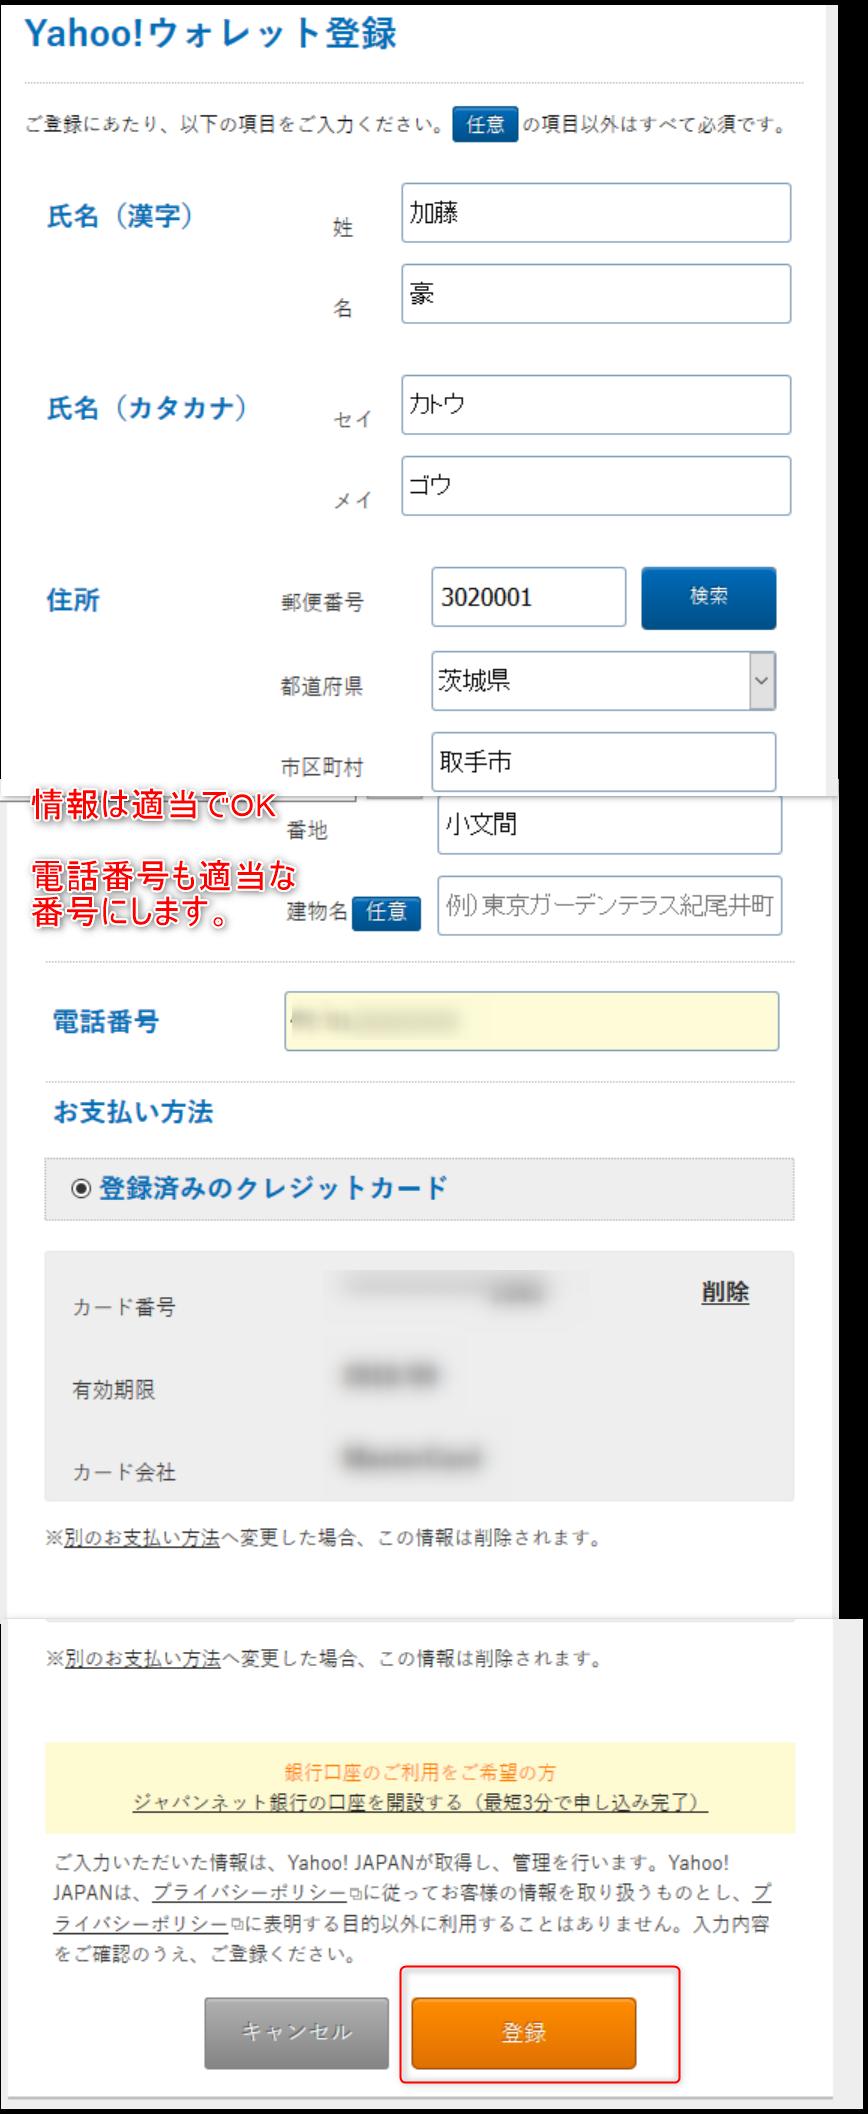 2018 02 02 16h09 28 ヤフオクプレミアム登録アカウントの作成手順